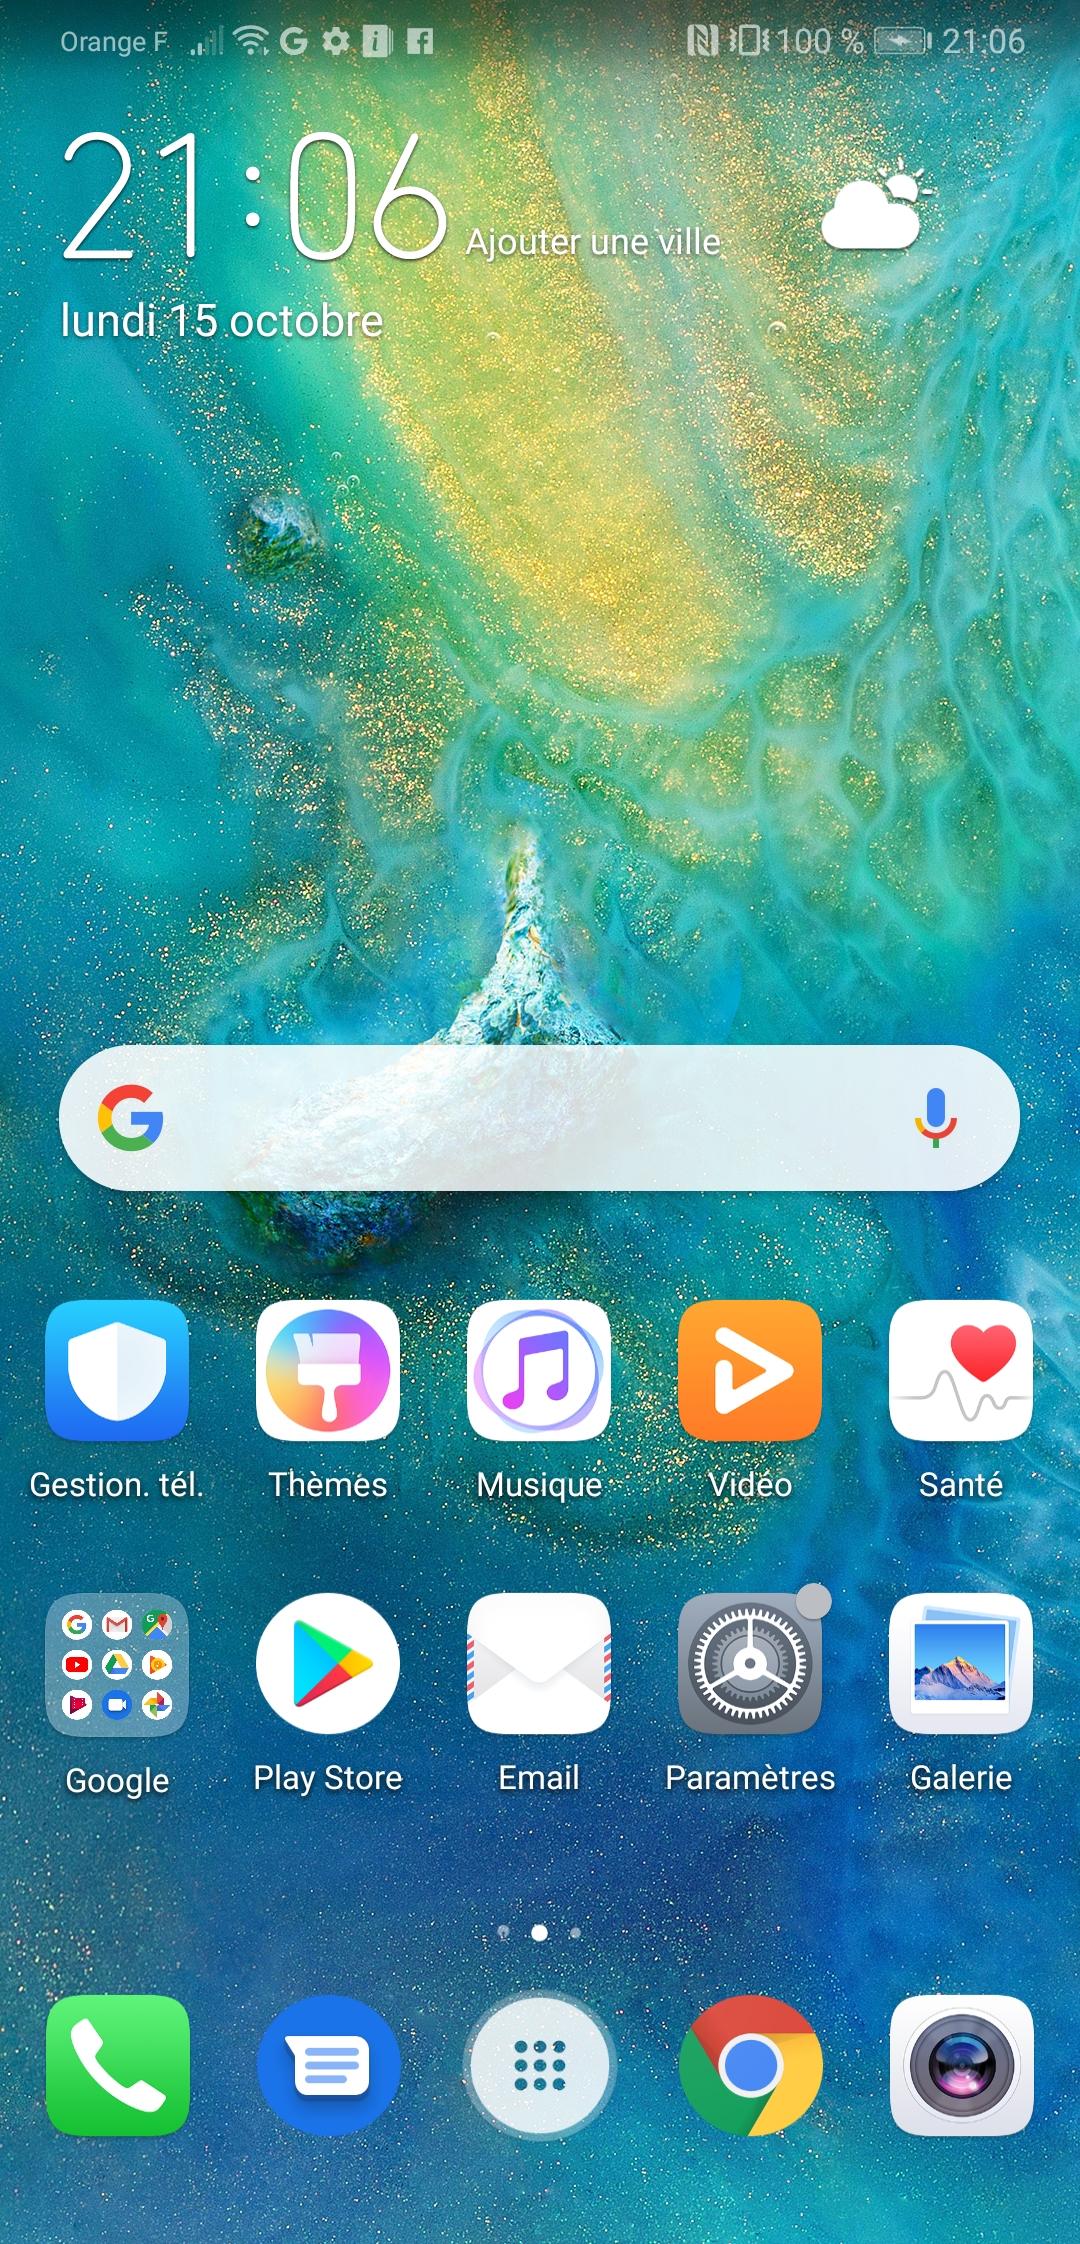 how to take a screenshot on huawei android phone